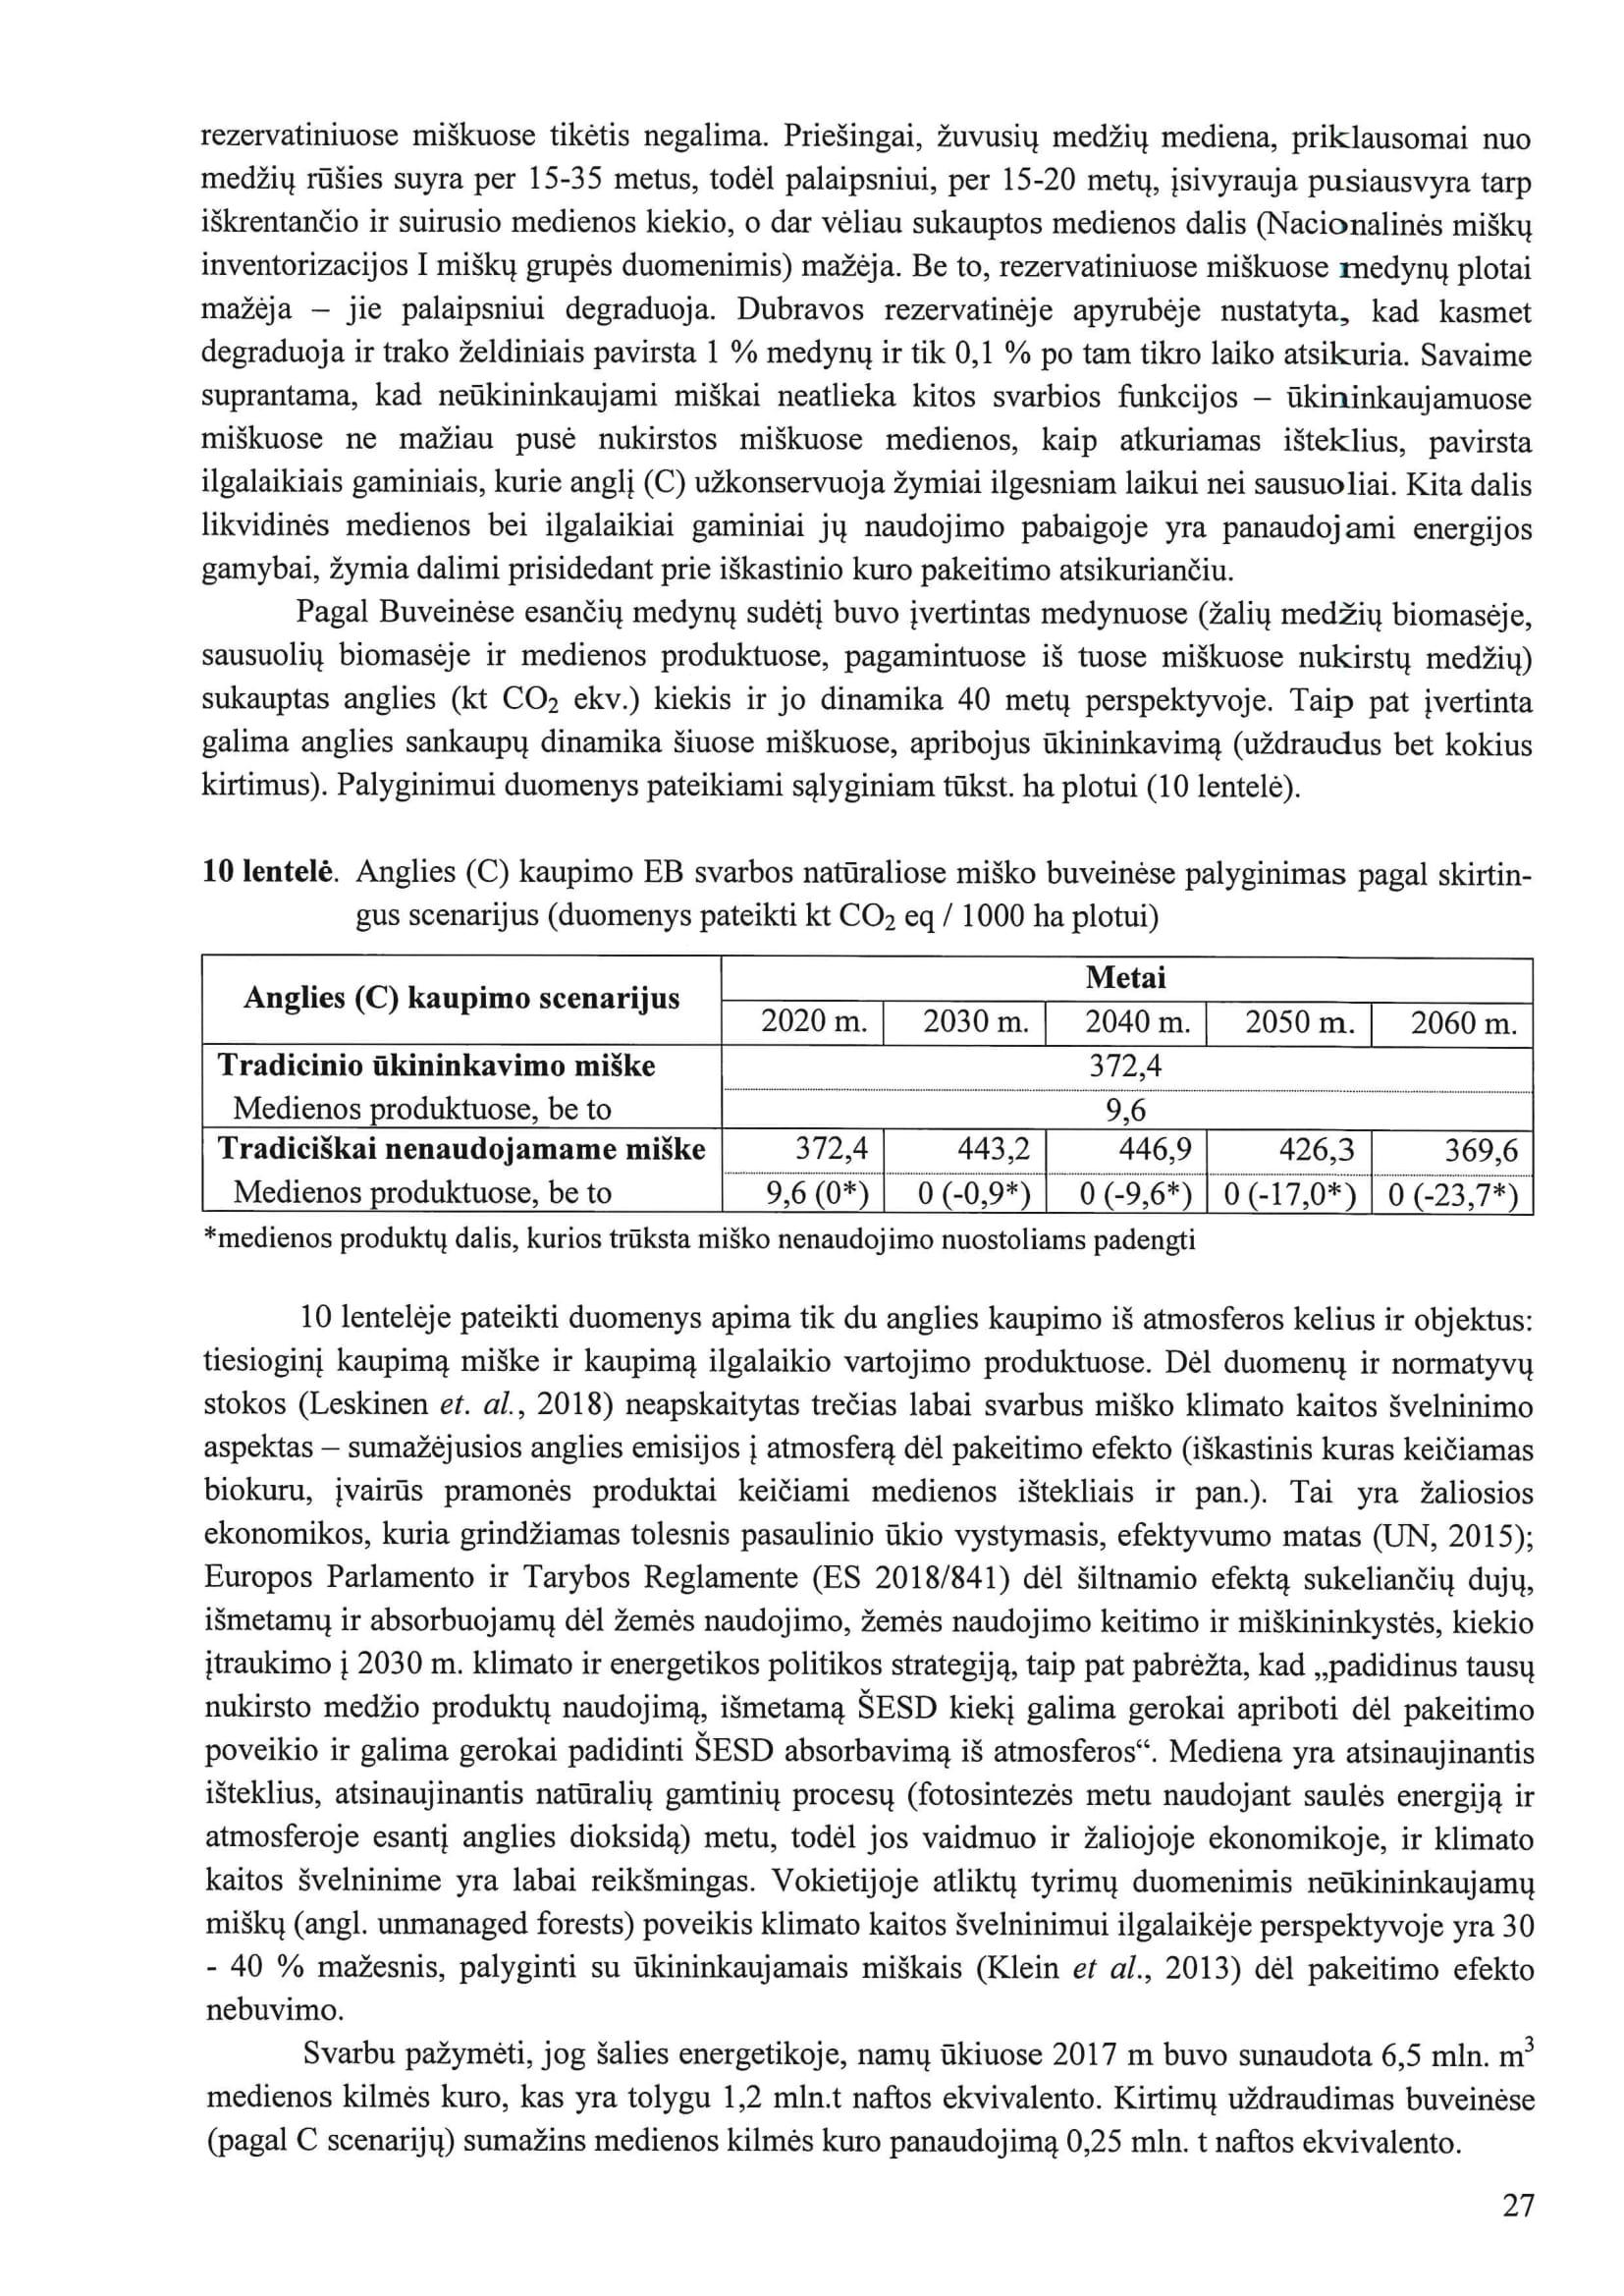 EB buveiniu Pazyma VMT VMU VSTT 2019.01.23 (su parasais)[38073]-27